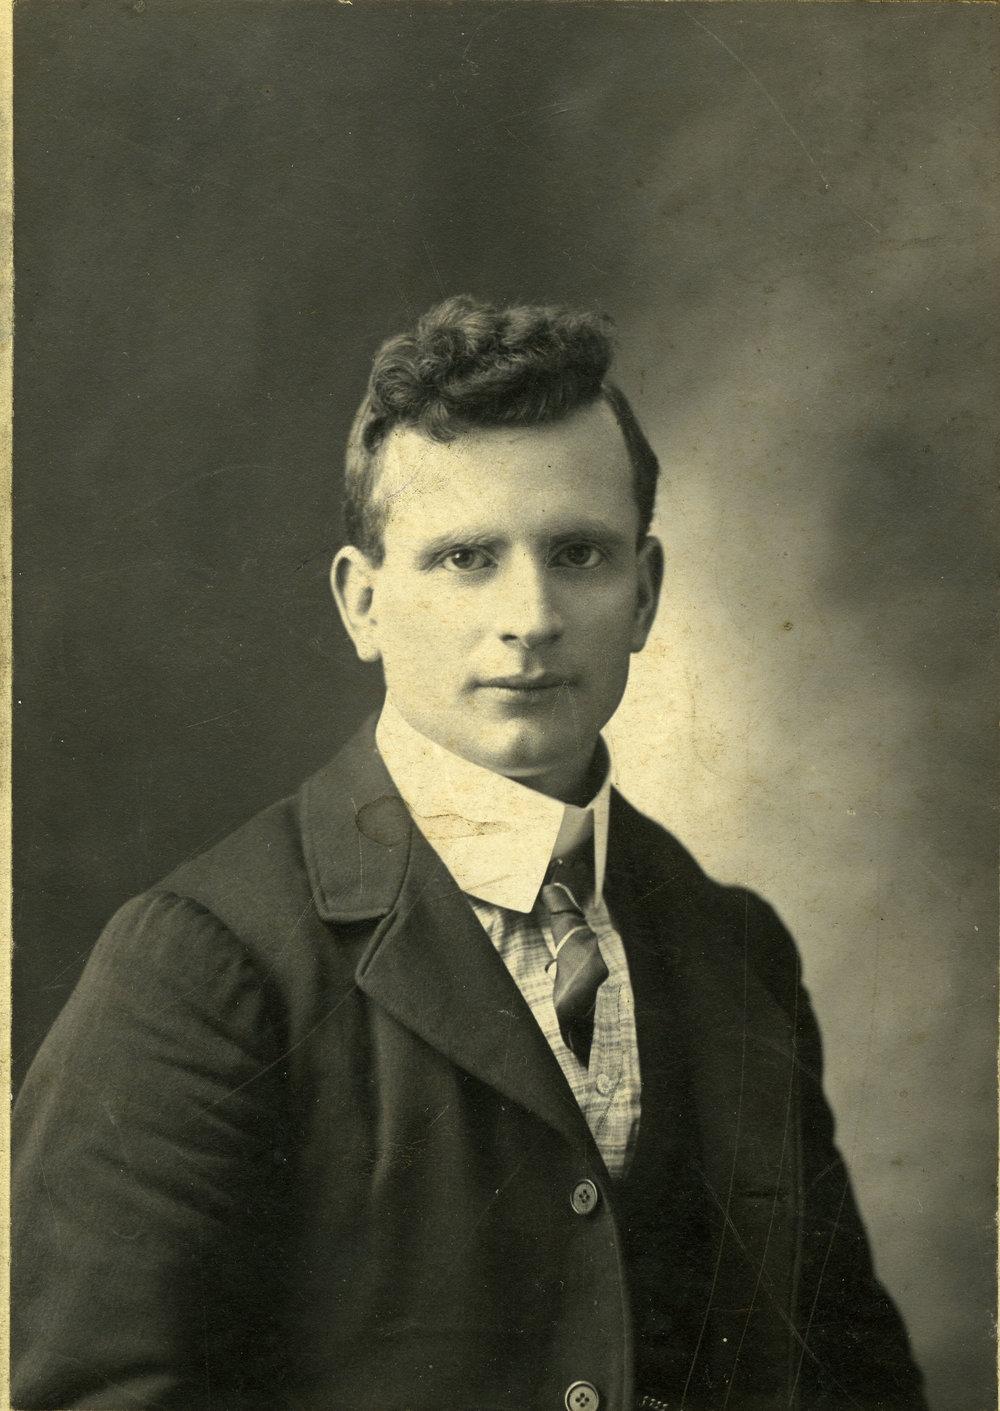 Hector McKinnon